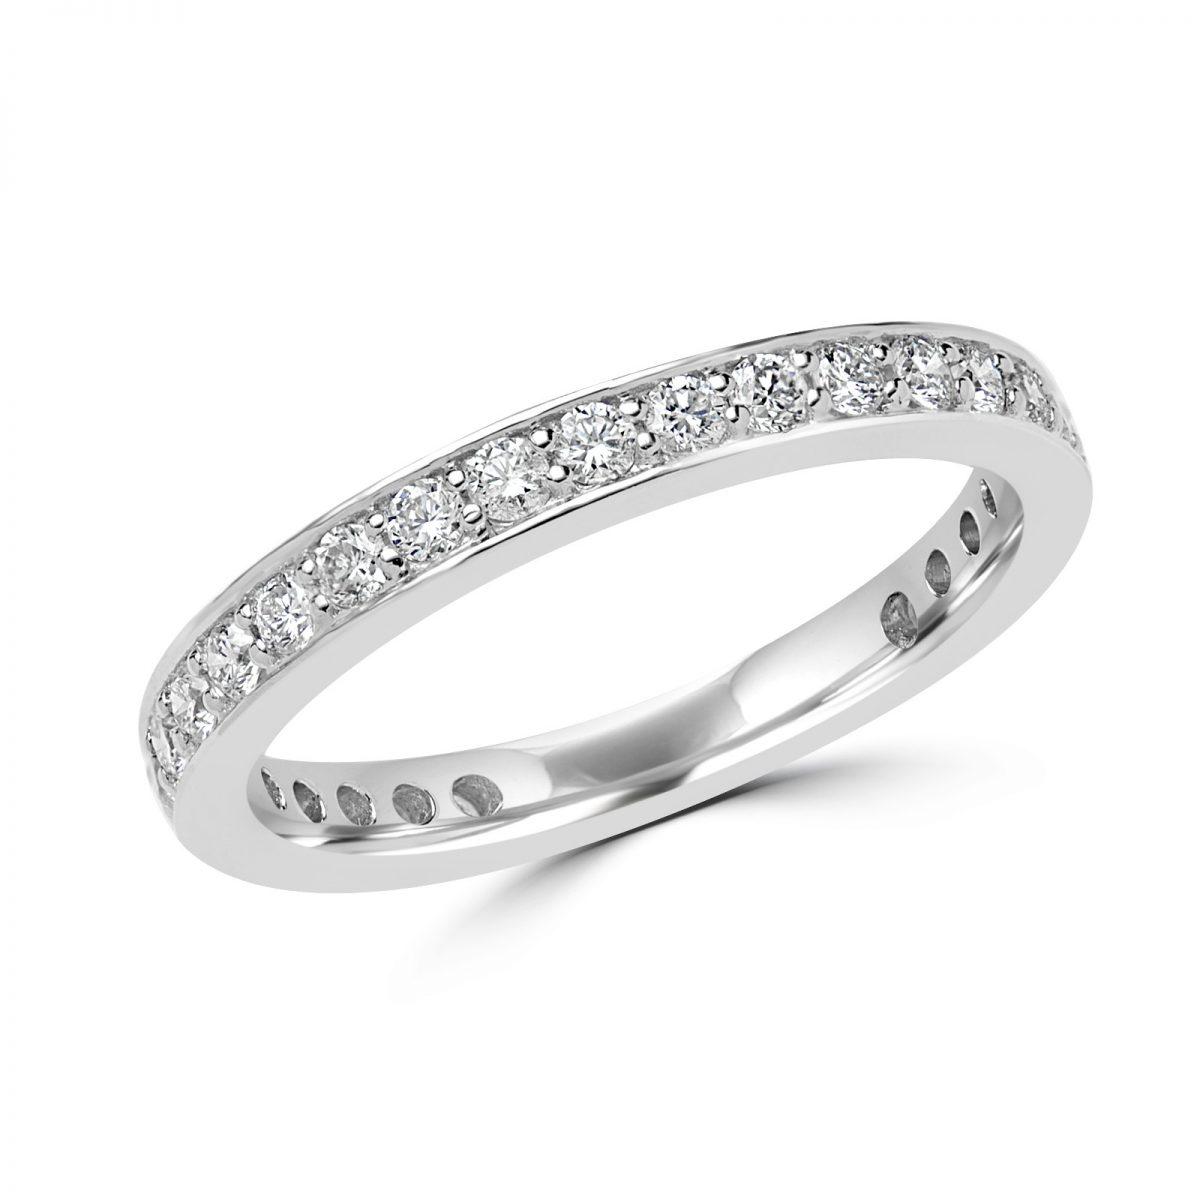 062 CARAT CTW DIAMOND SIZEABLE ETERNITY WEDDING BAND ANNIVERSARY